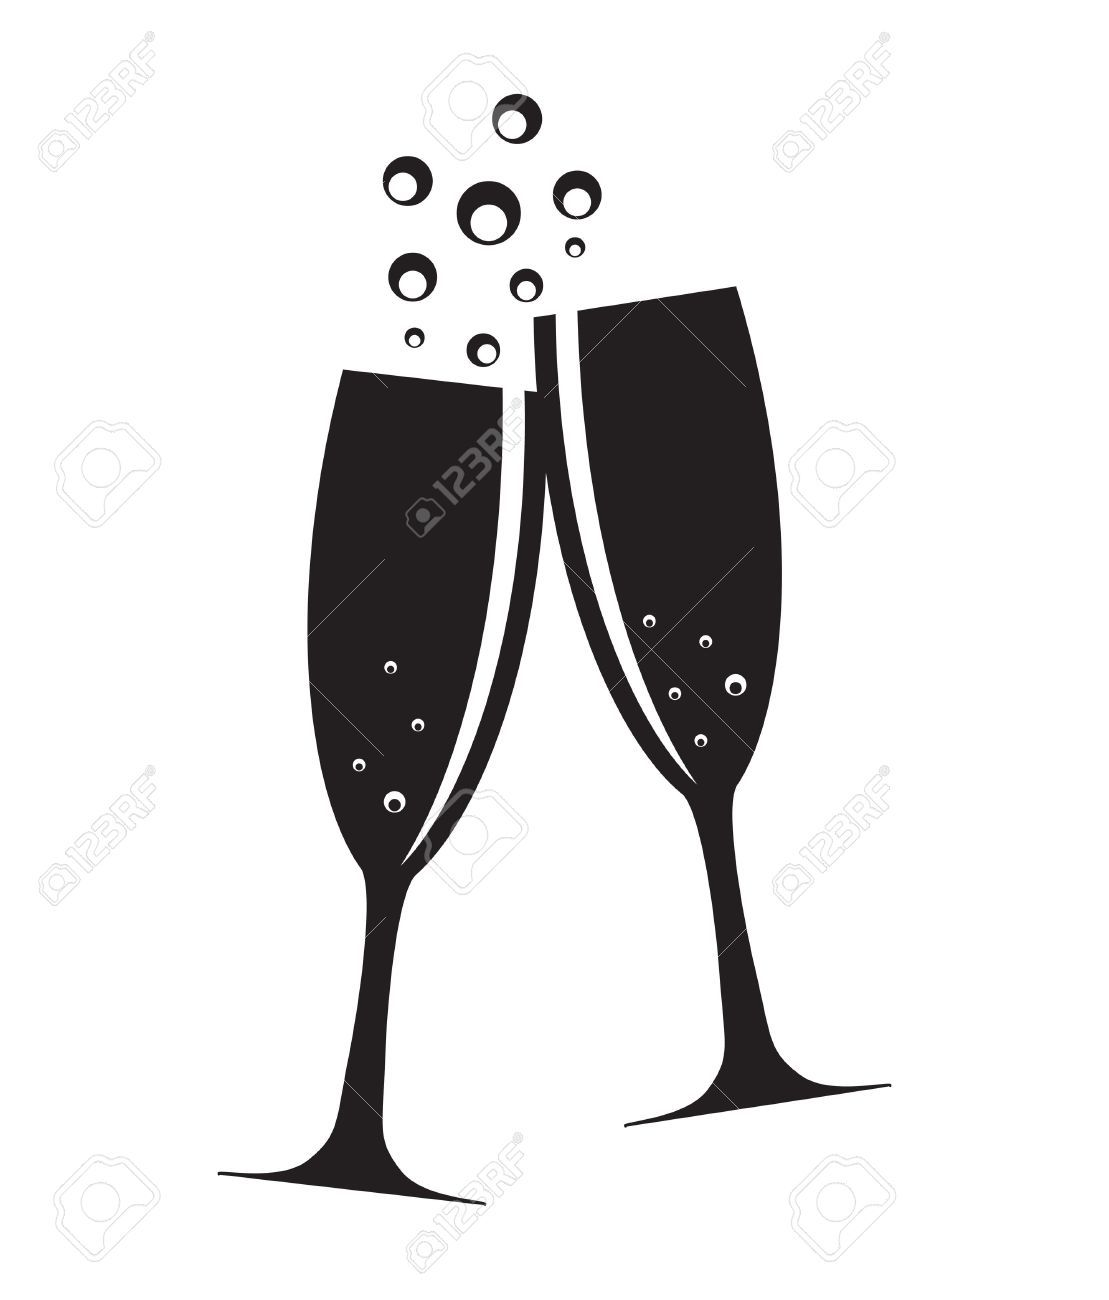 Champagne glass clipart black and white 3 » Clipart Portal.